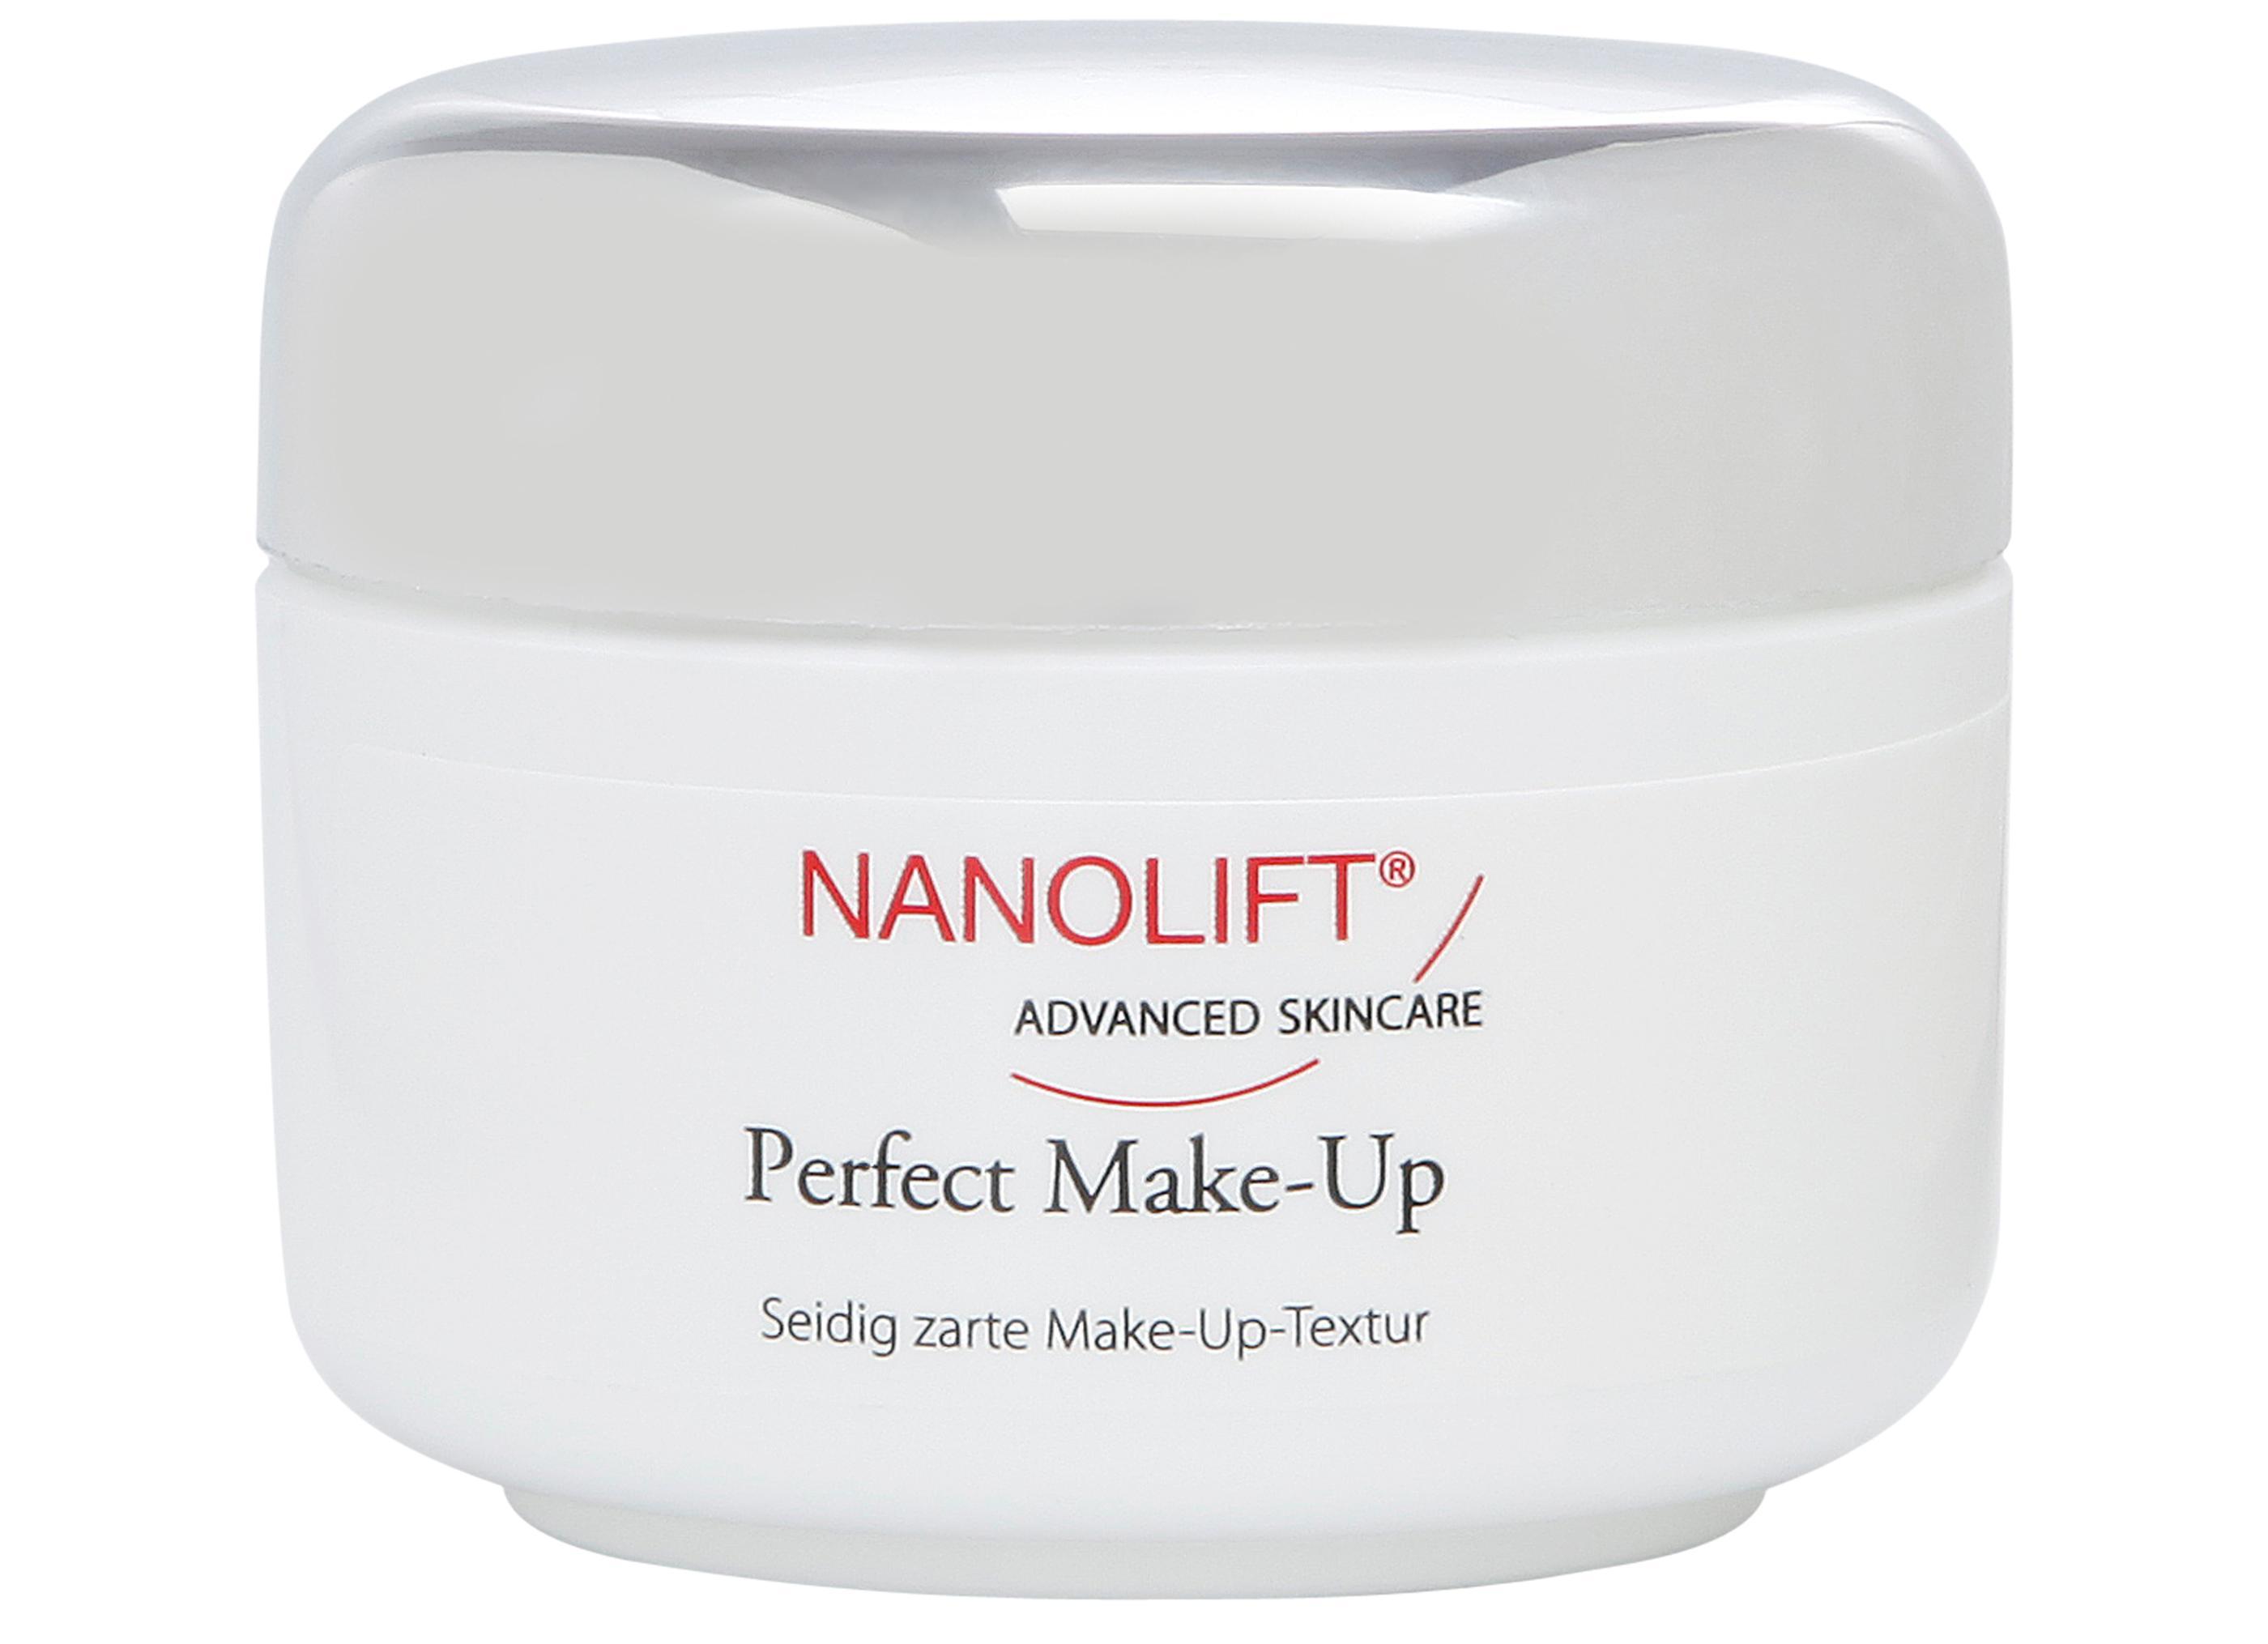 nanolift perfect make up 50ml perfekte abdeckung anti age. Black Bedroom Furniture Sets. Home Design Ideas